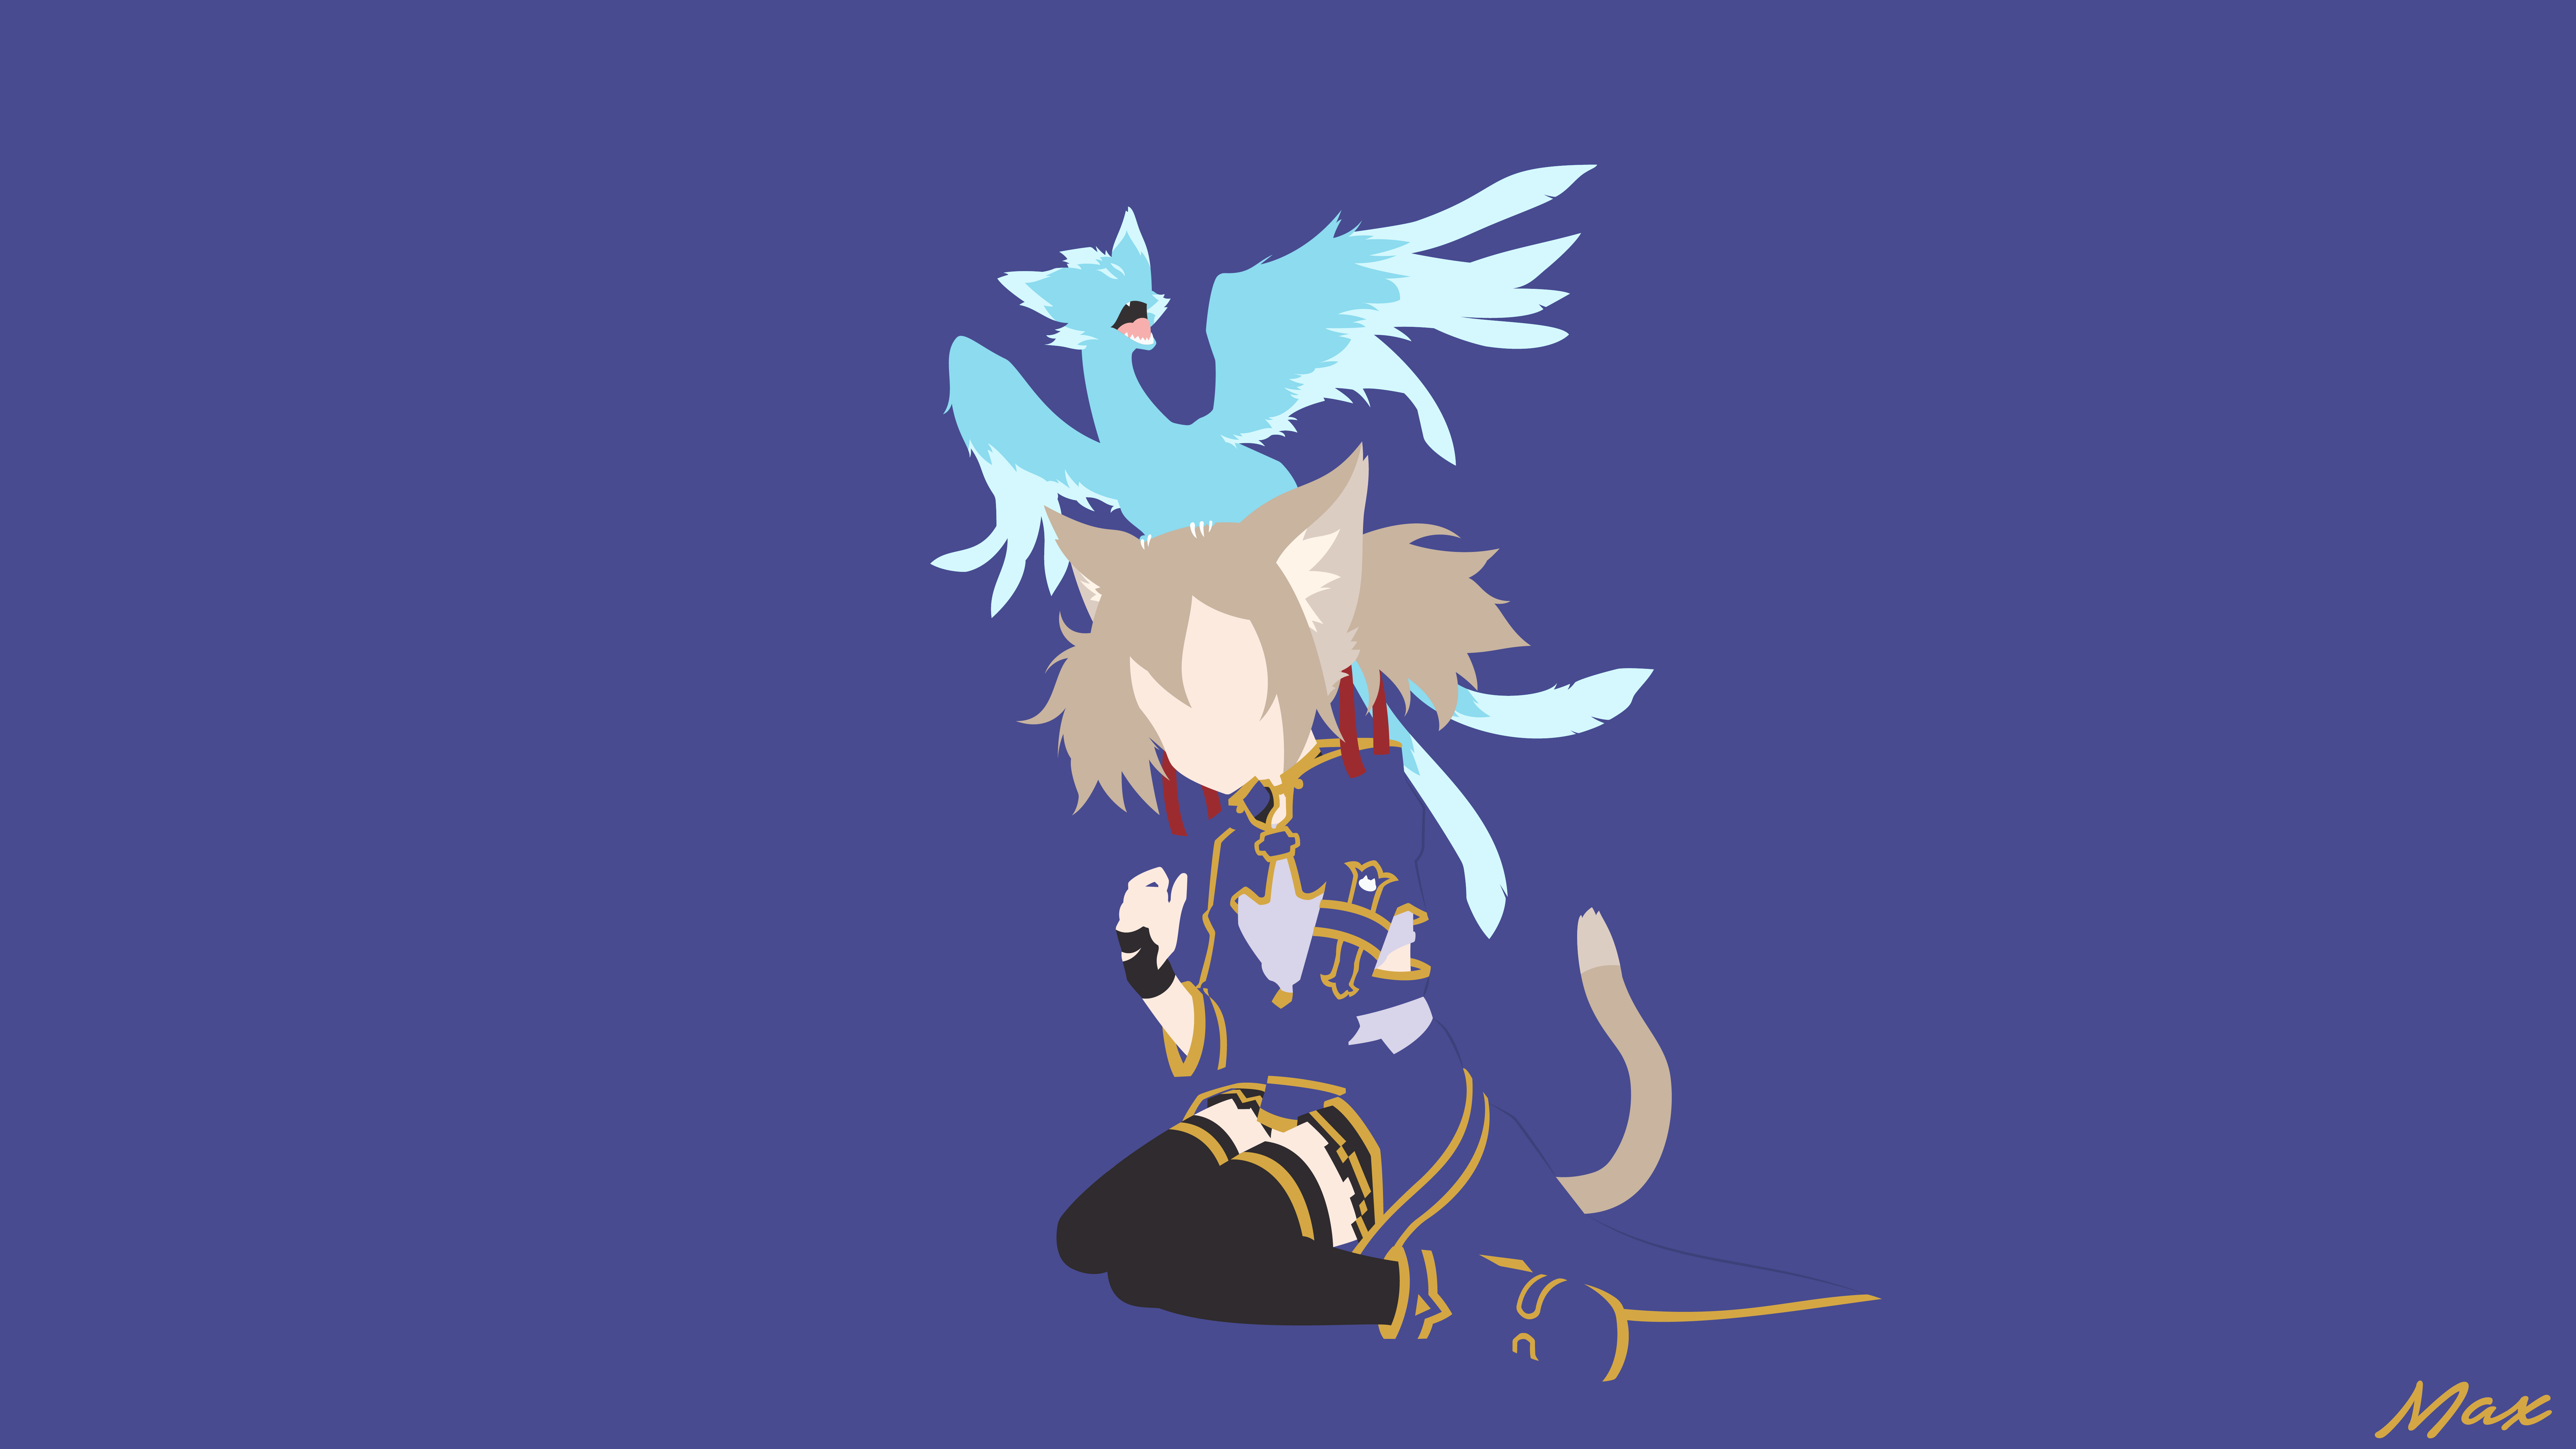 Silica [ALO] (Sword Art Online) Minimal Wallpaper by ...